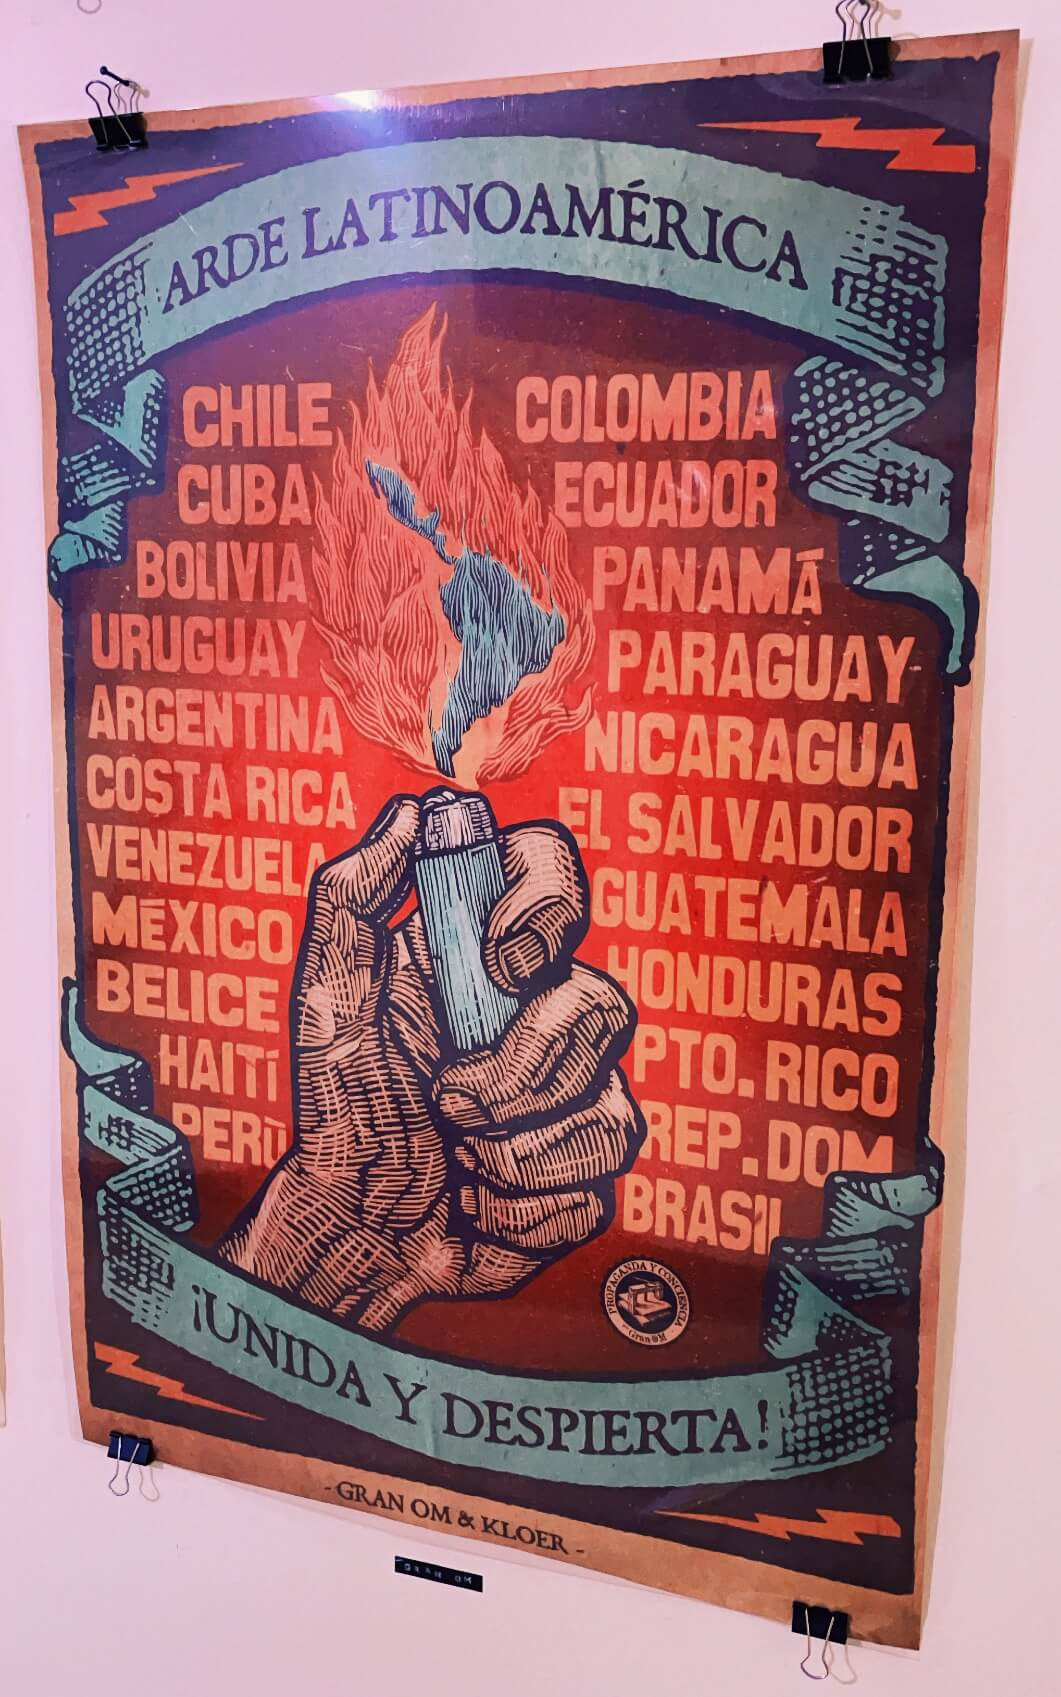 Causa_latinoamericana1